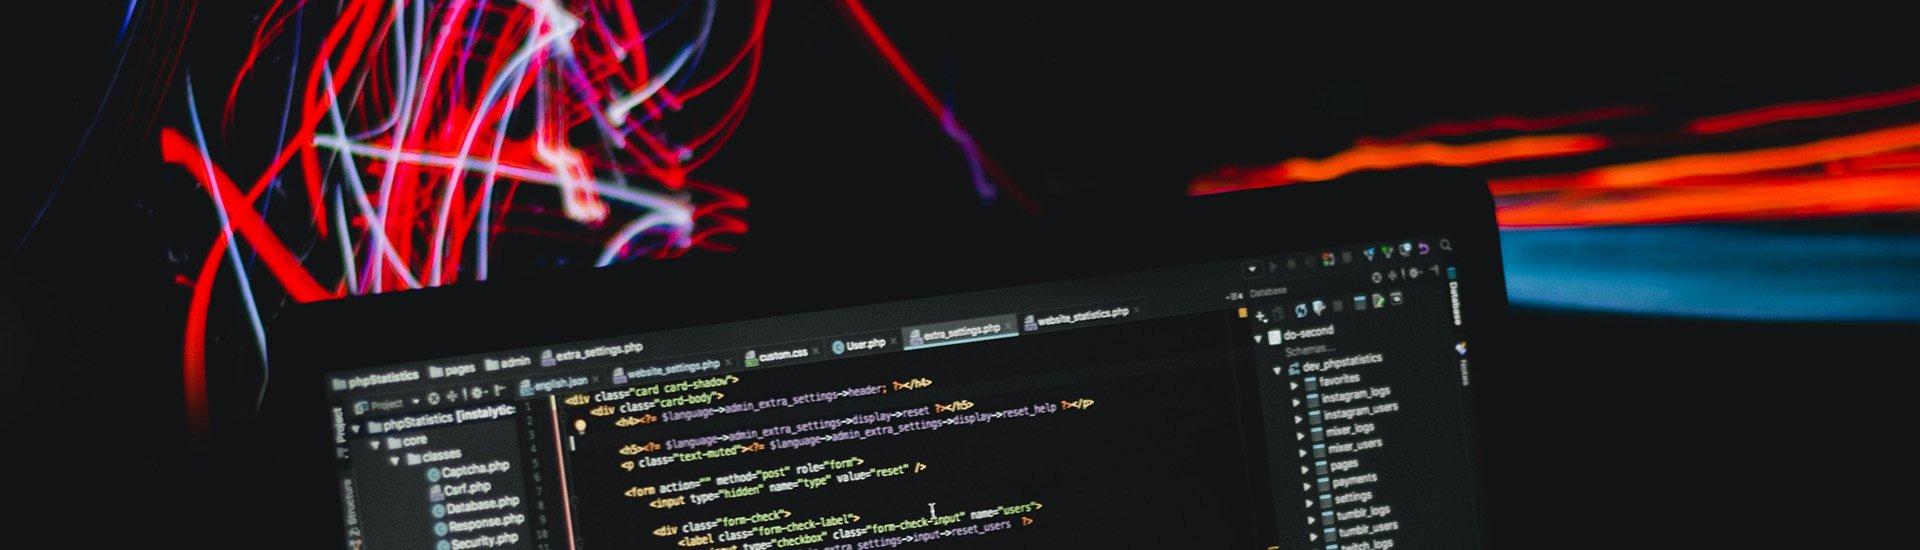 code-machine-learning